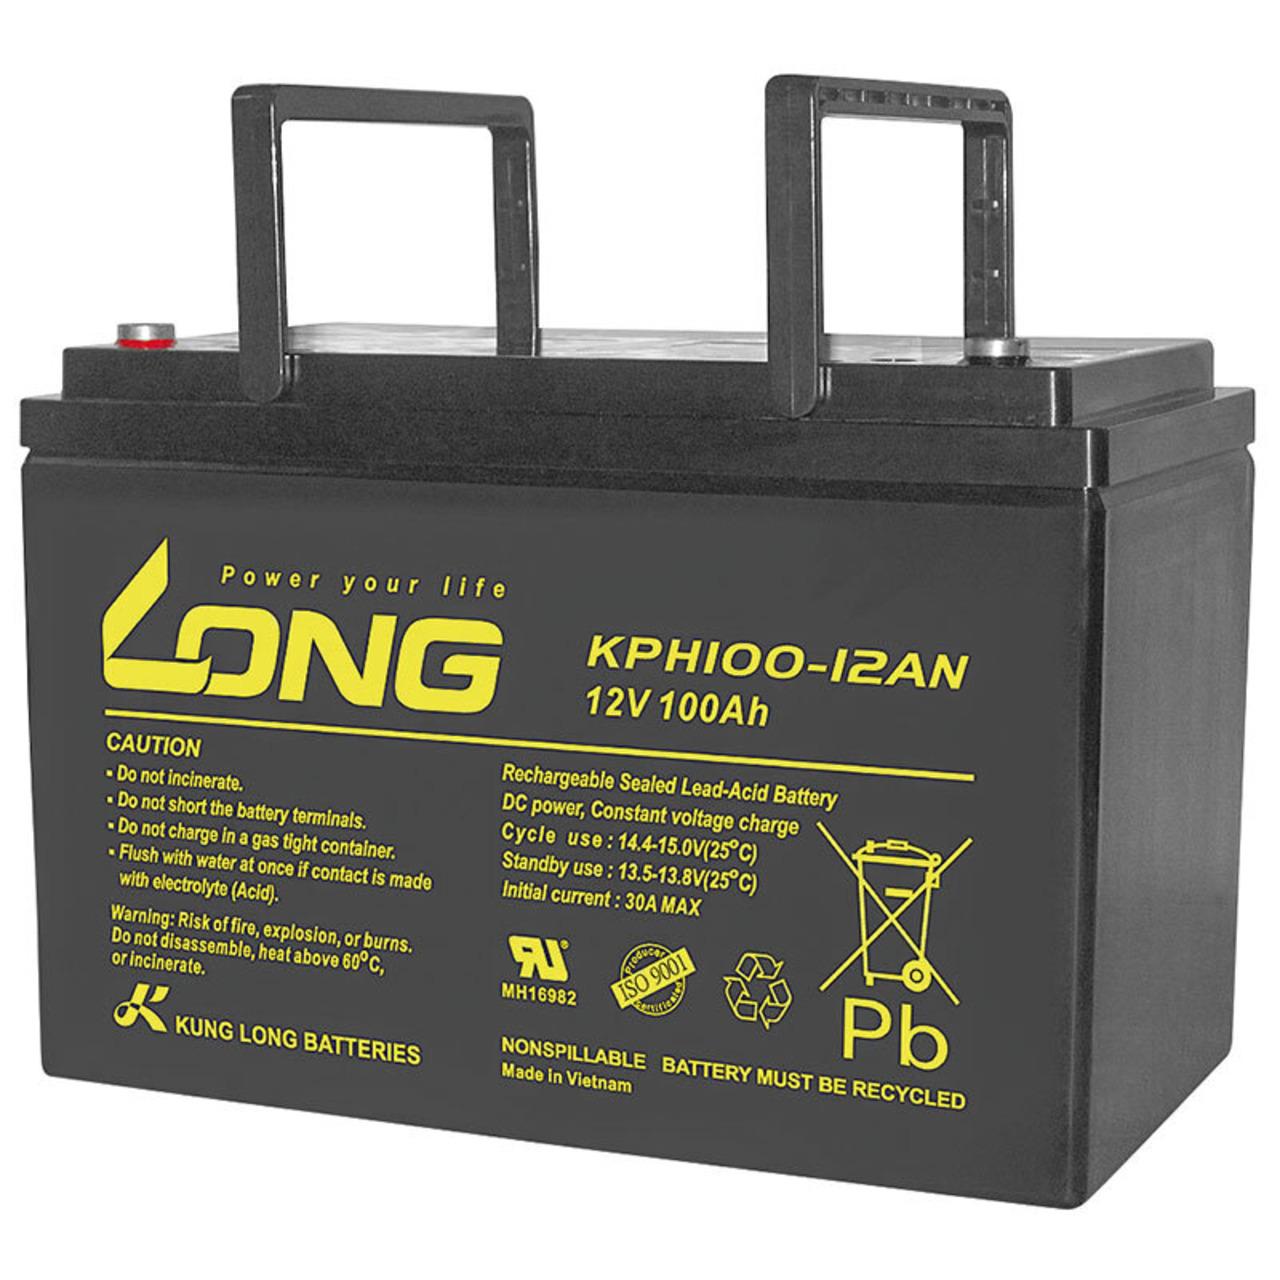 Kung Long Blei-AGM-Akku KPH100-12AN- 12 V- 100 Ah